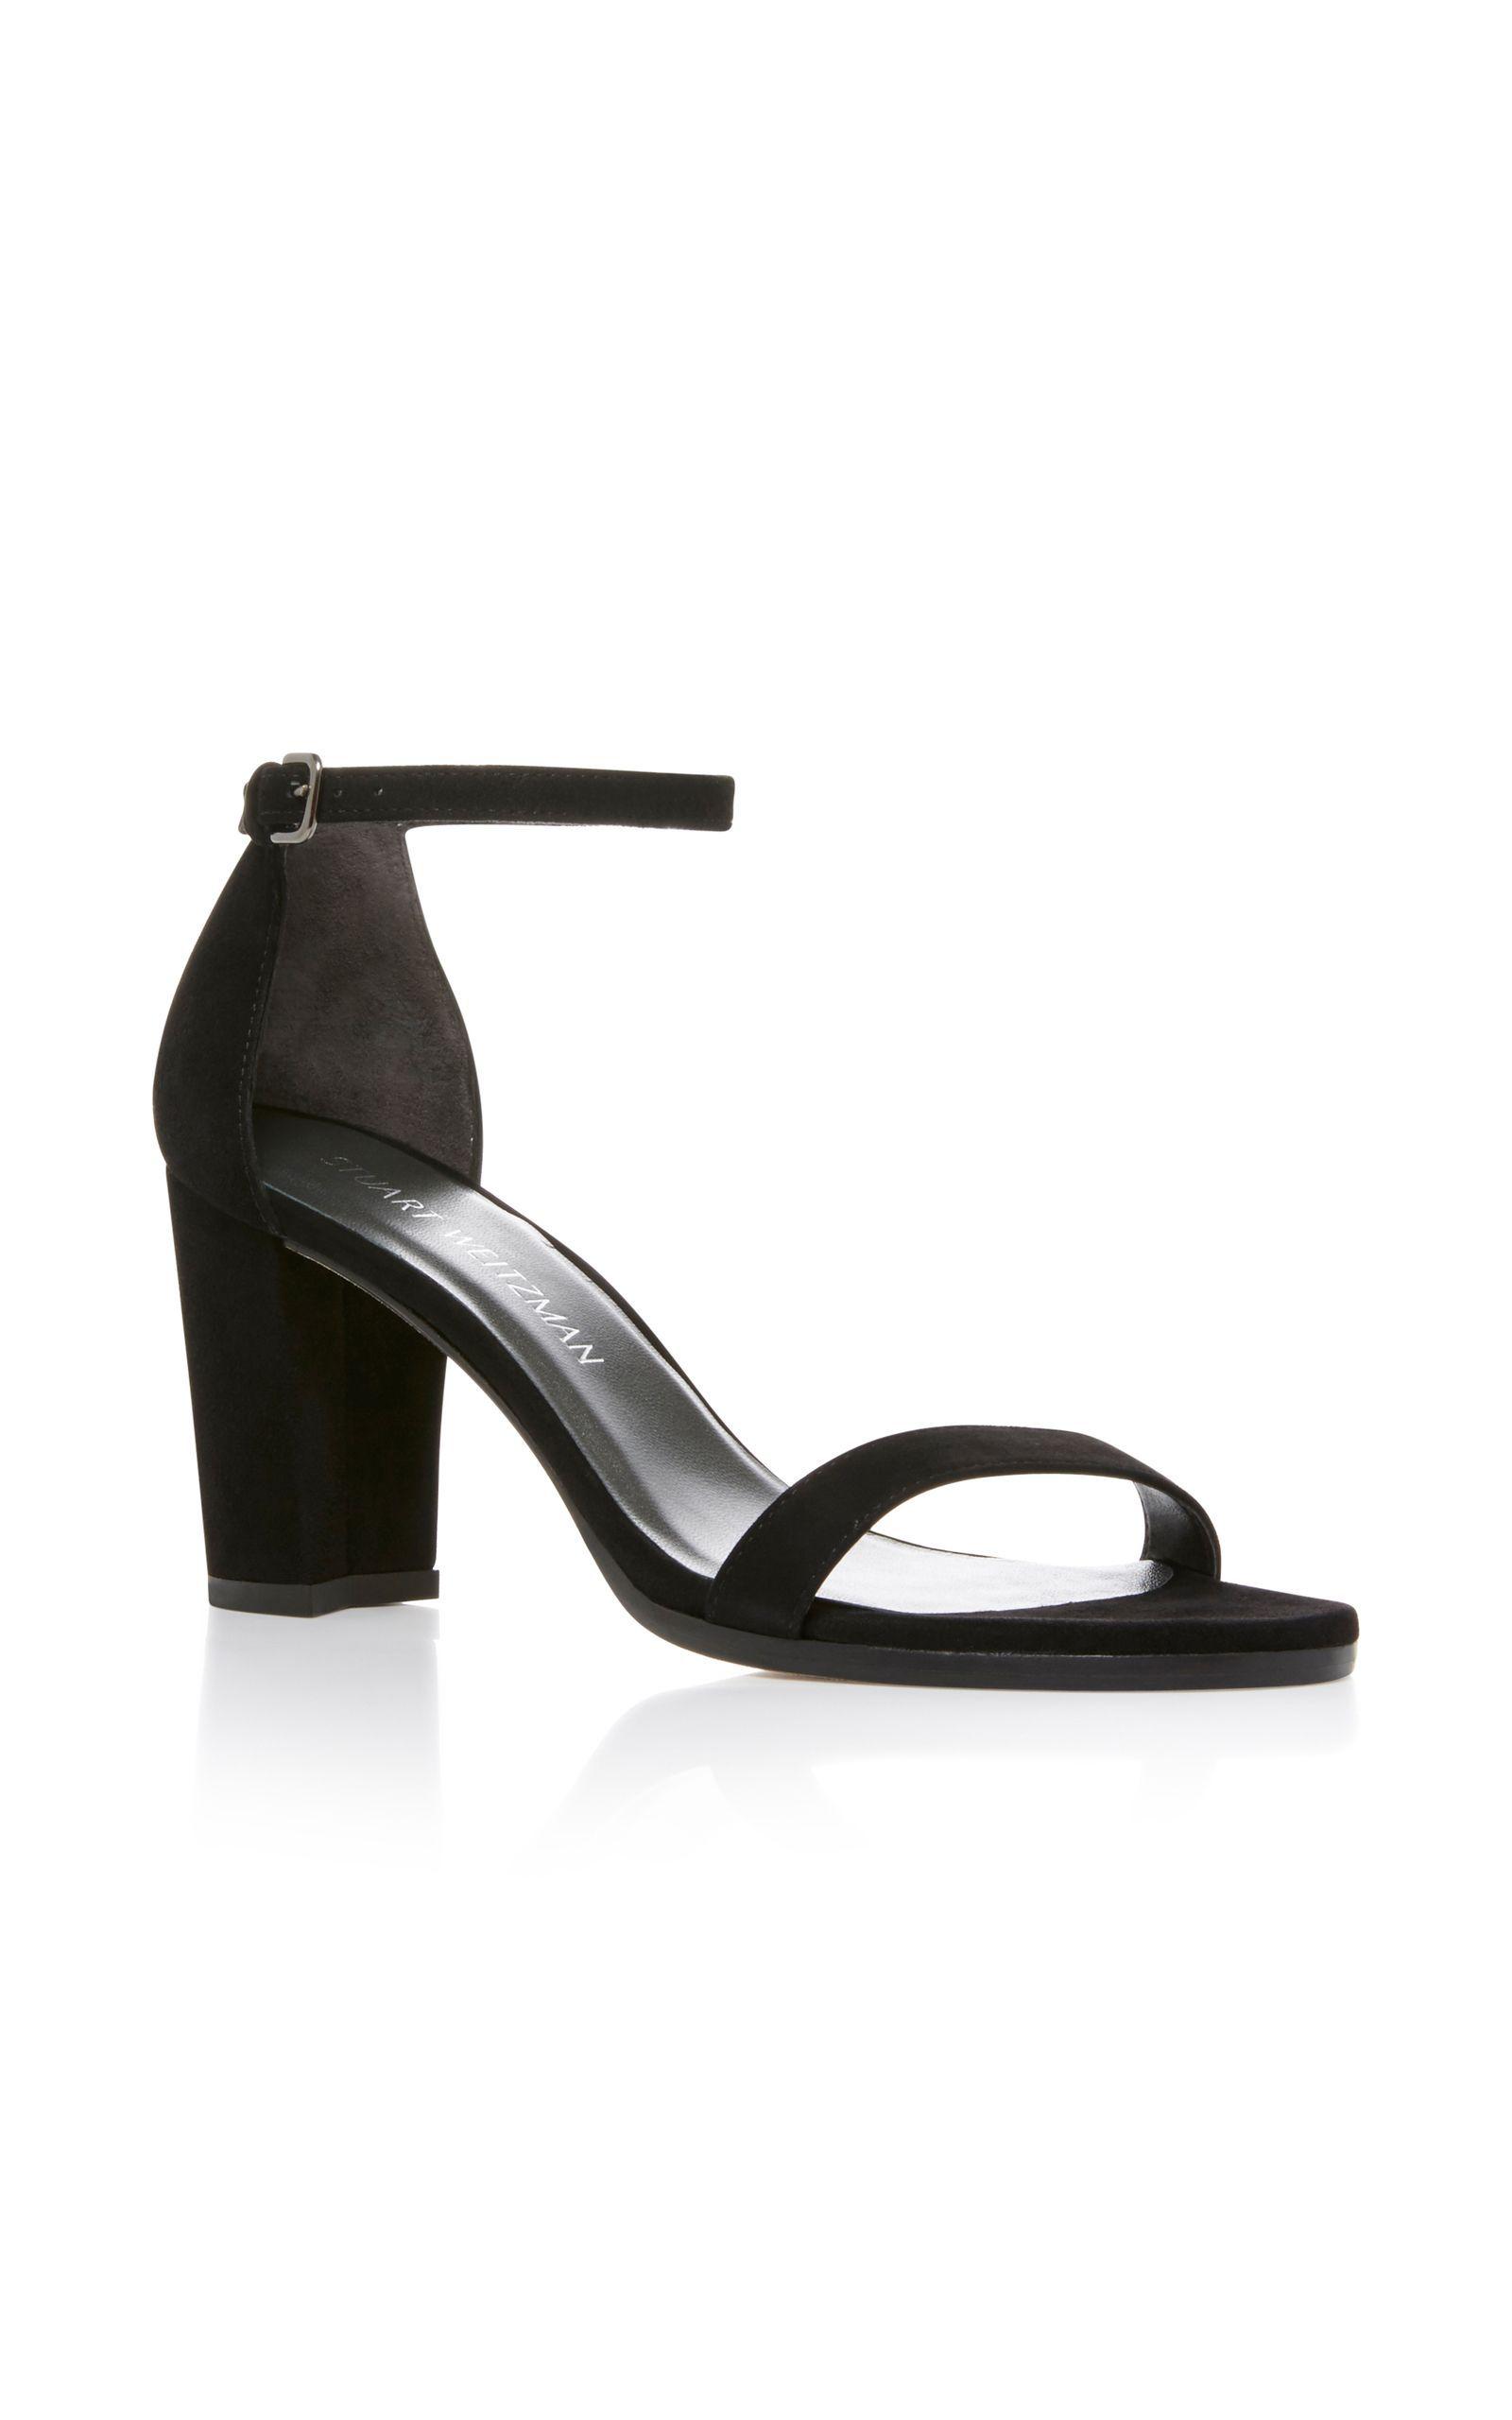 ffdfddbfc04 STUART WEITZMAN Nearlynude Sandal.  stuartweitzman  shoes  sandals ...